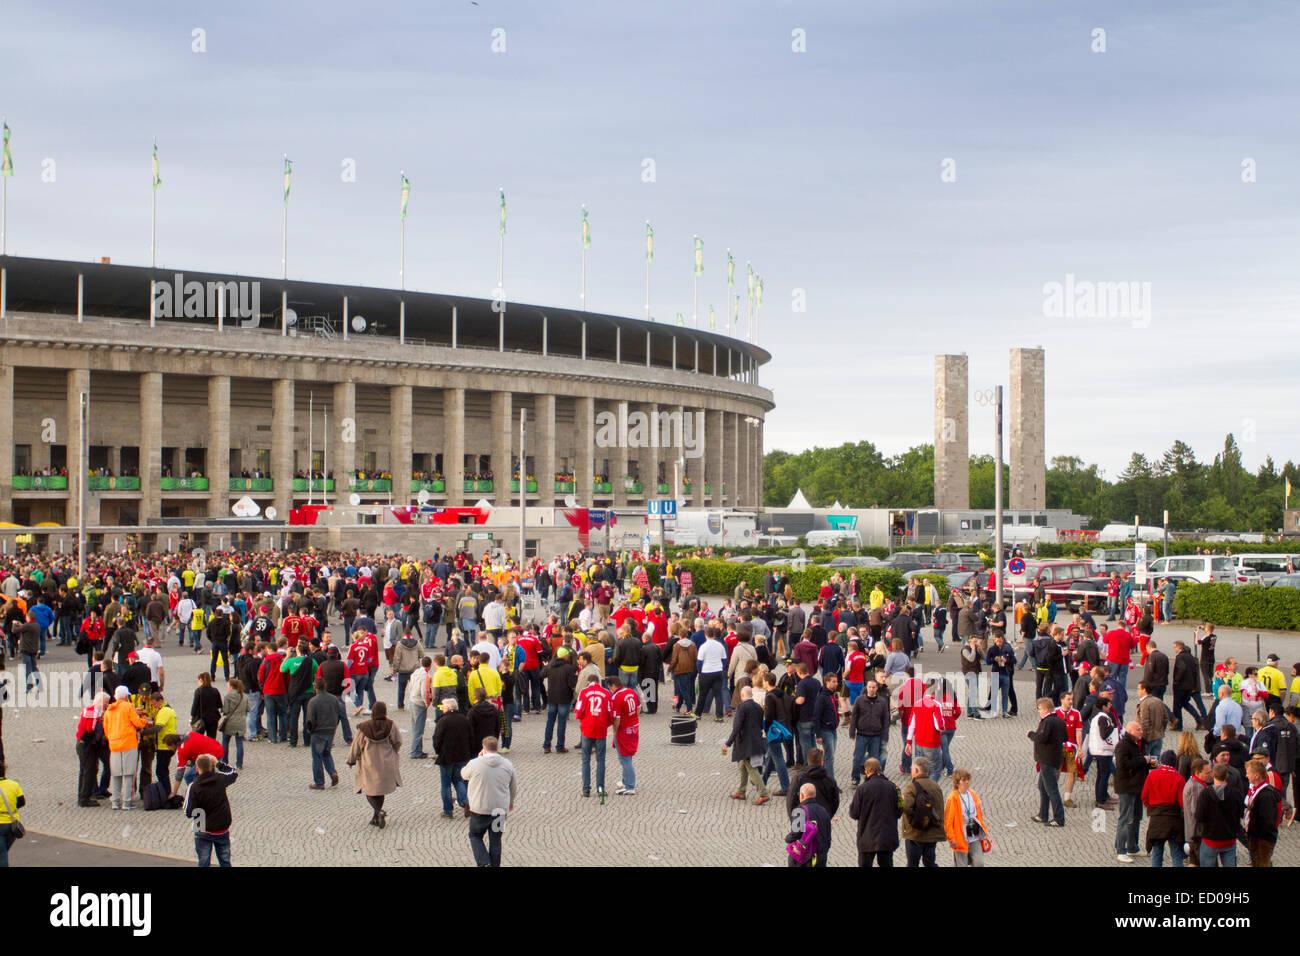 Olympiastadion, Berlin, Germany. - Stock Image